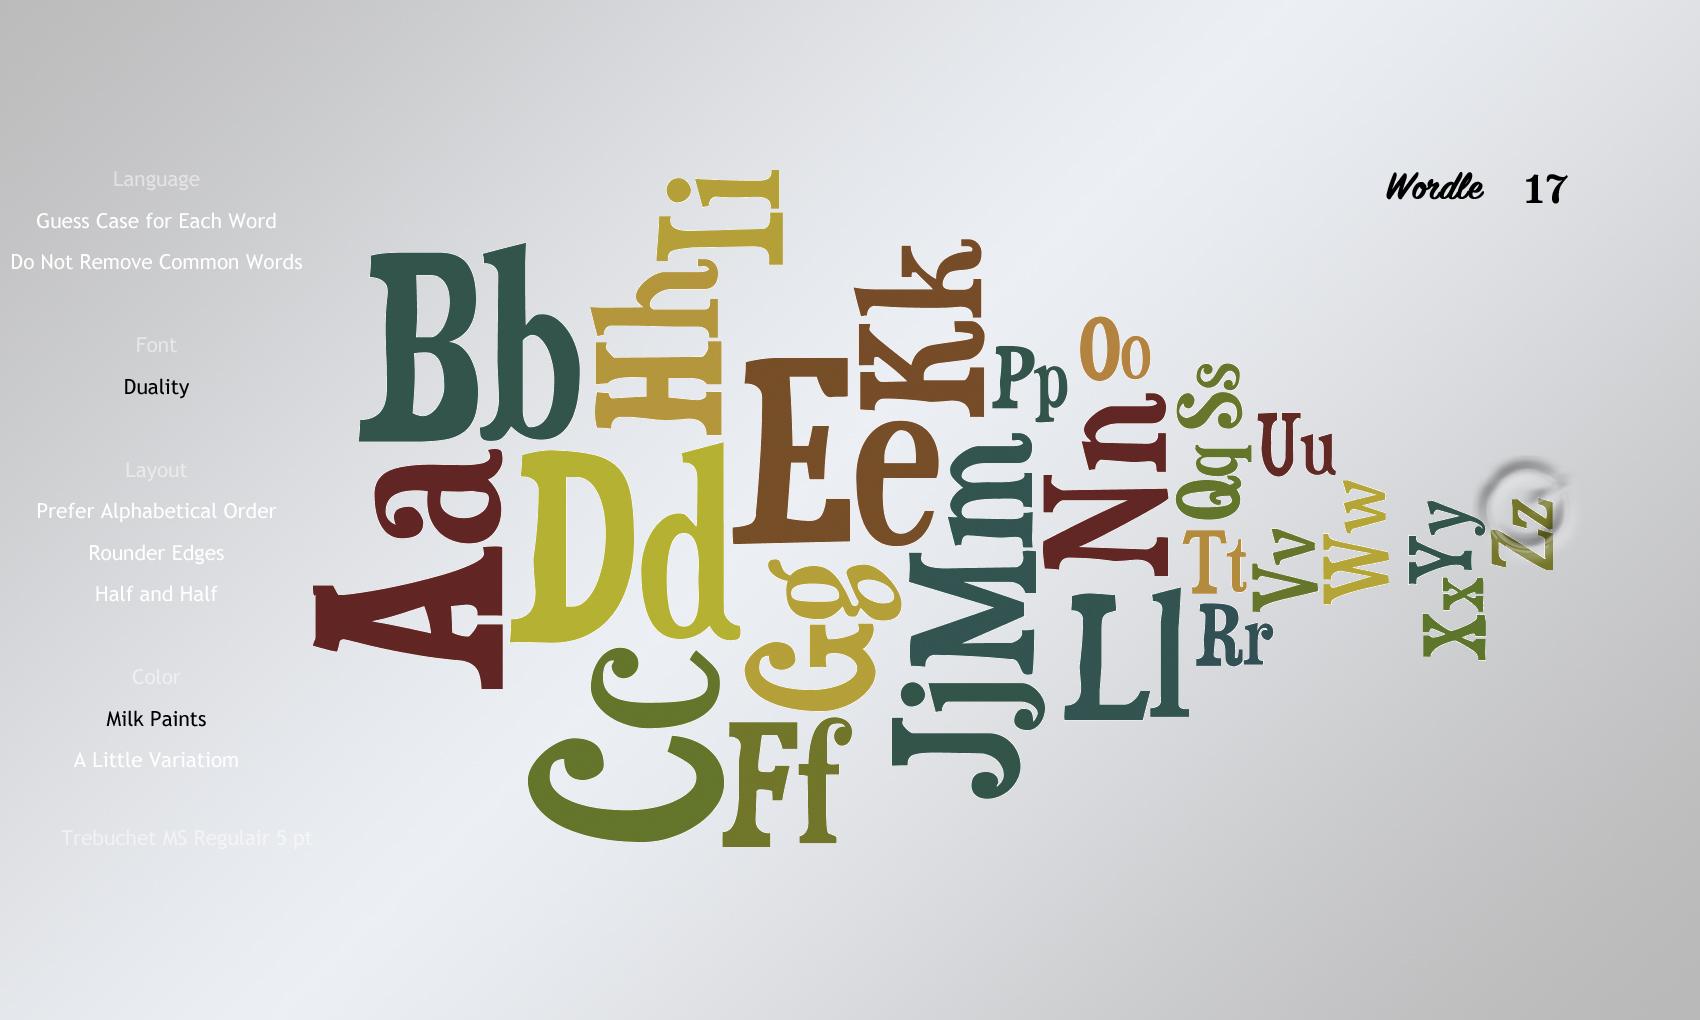 Wordle17 Duality